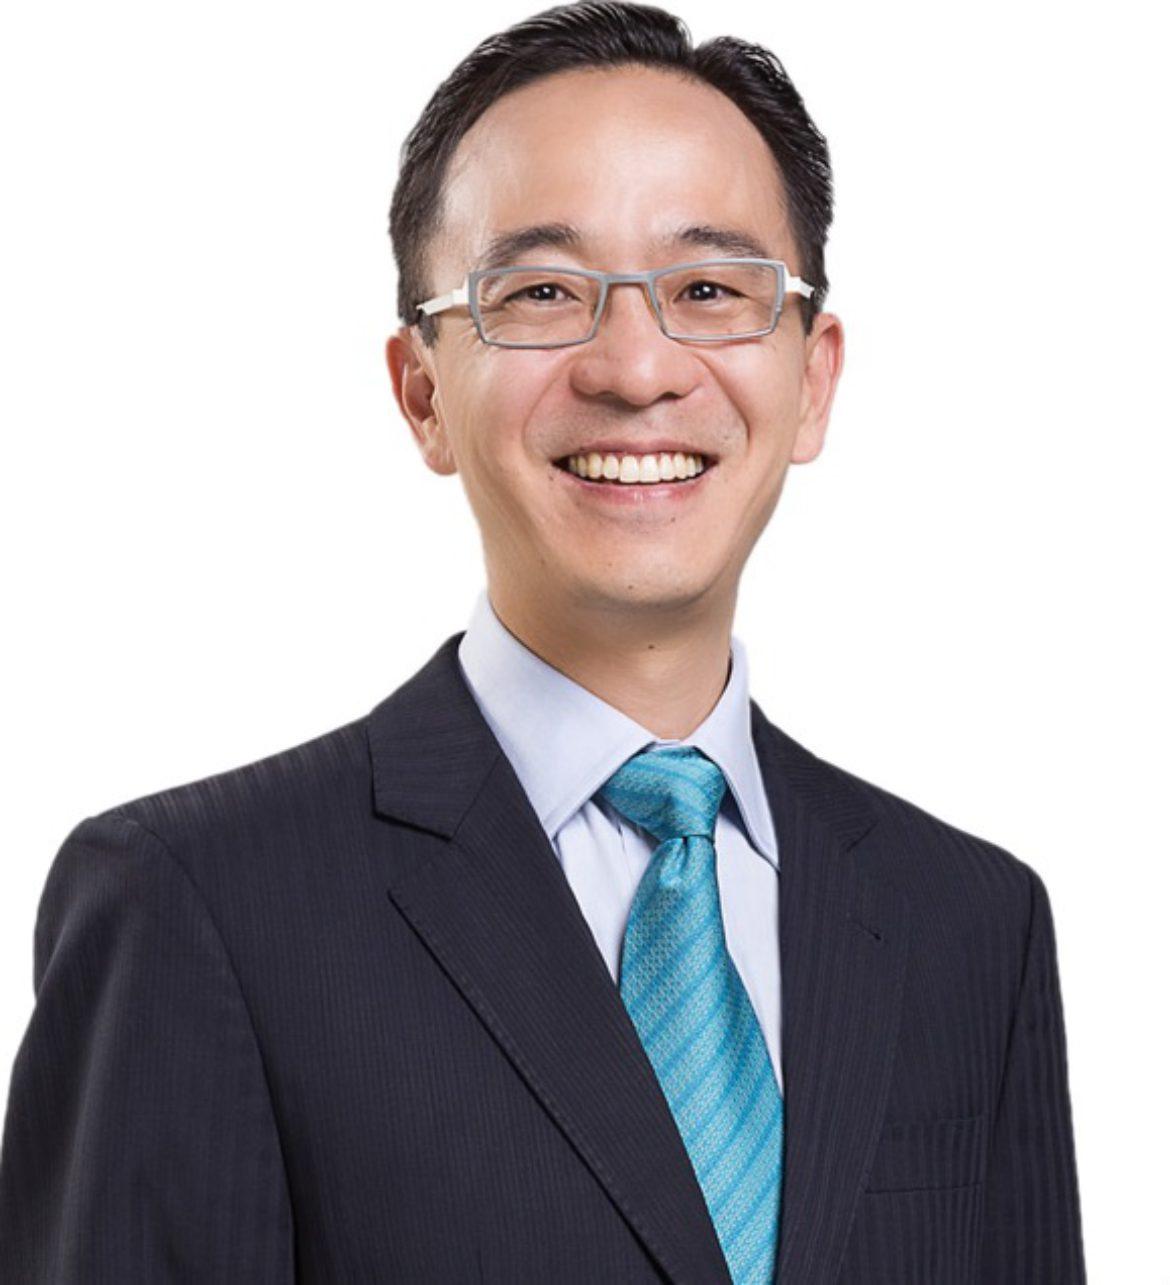 Marcio Nakanishi